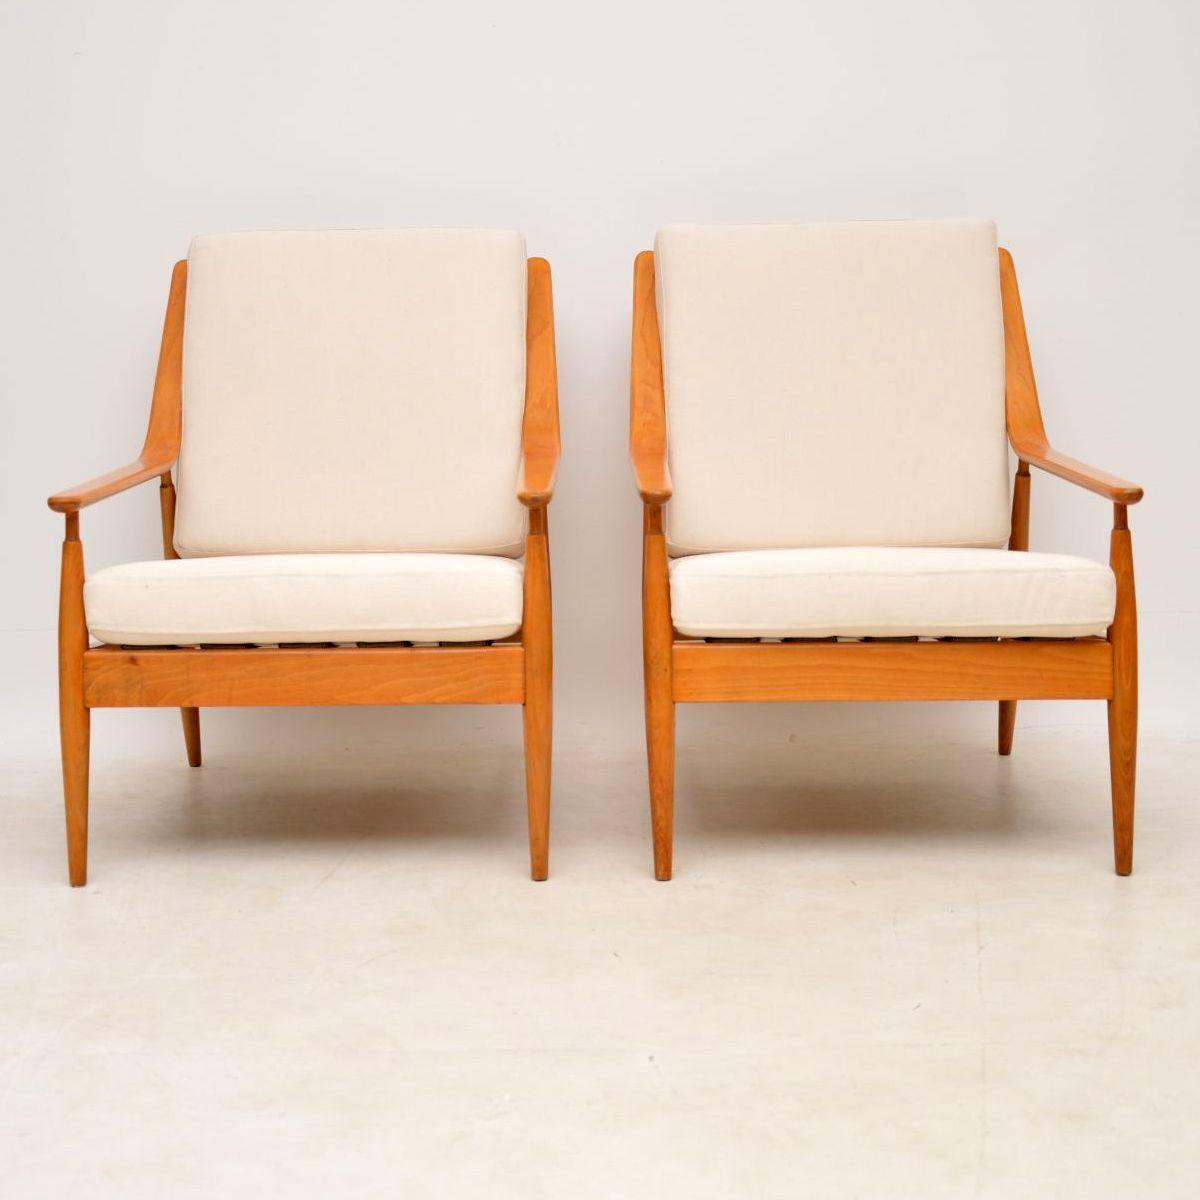 pair_of_danish_retro_vintage_scandart_armchairs_2